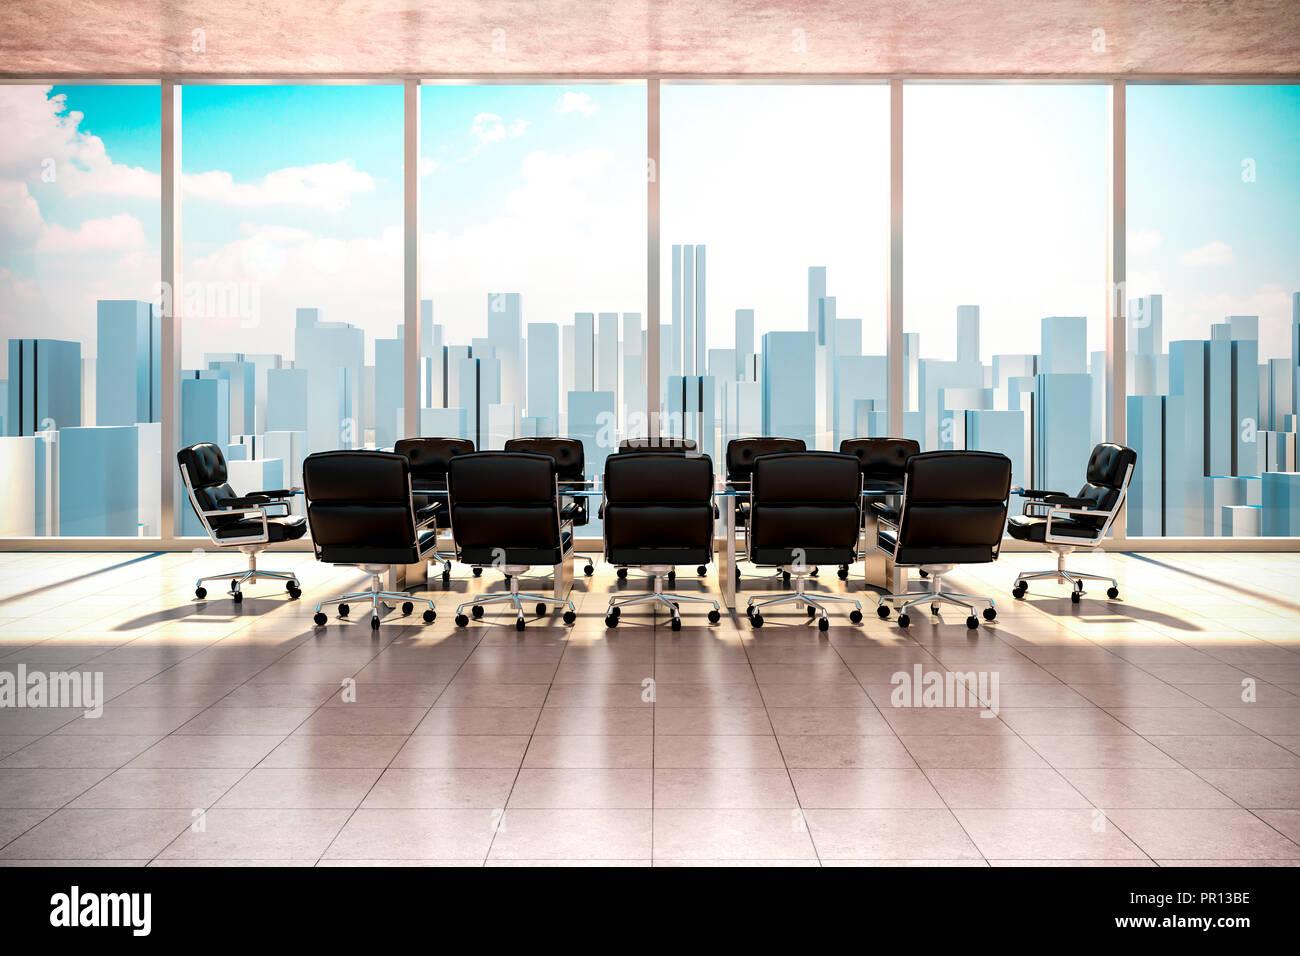 Daylight Corporate Construction Stock Photos Daylight Corporate